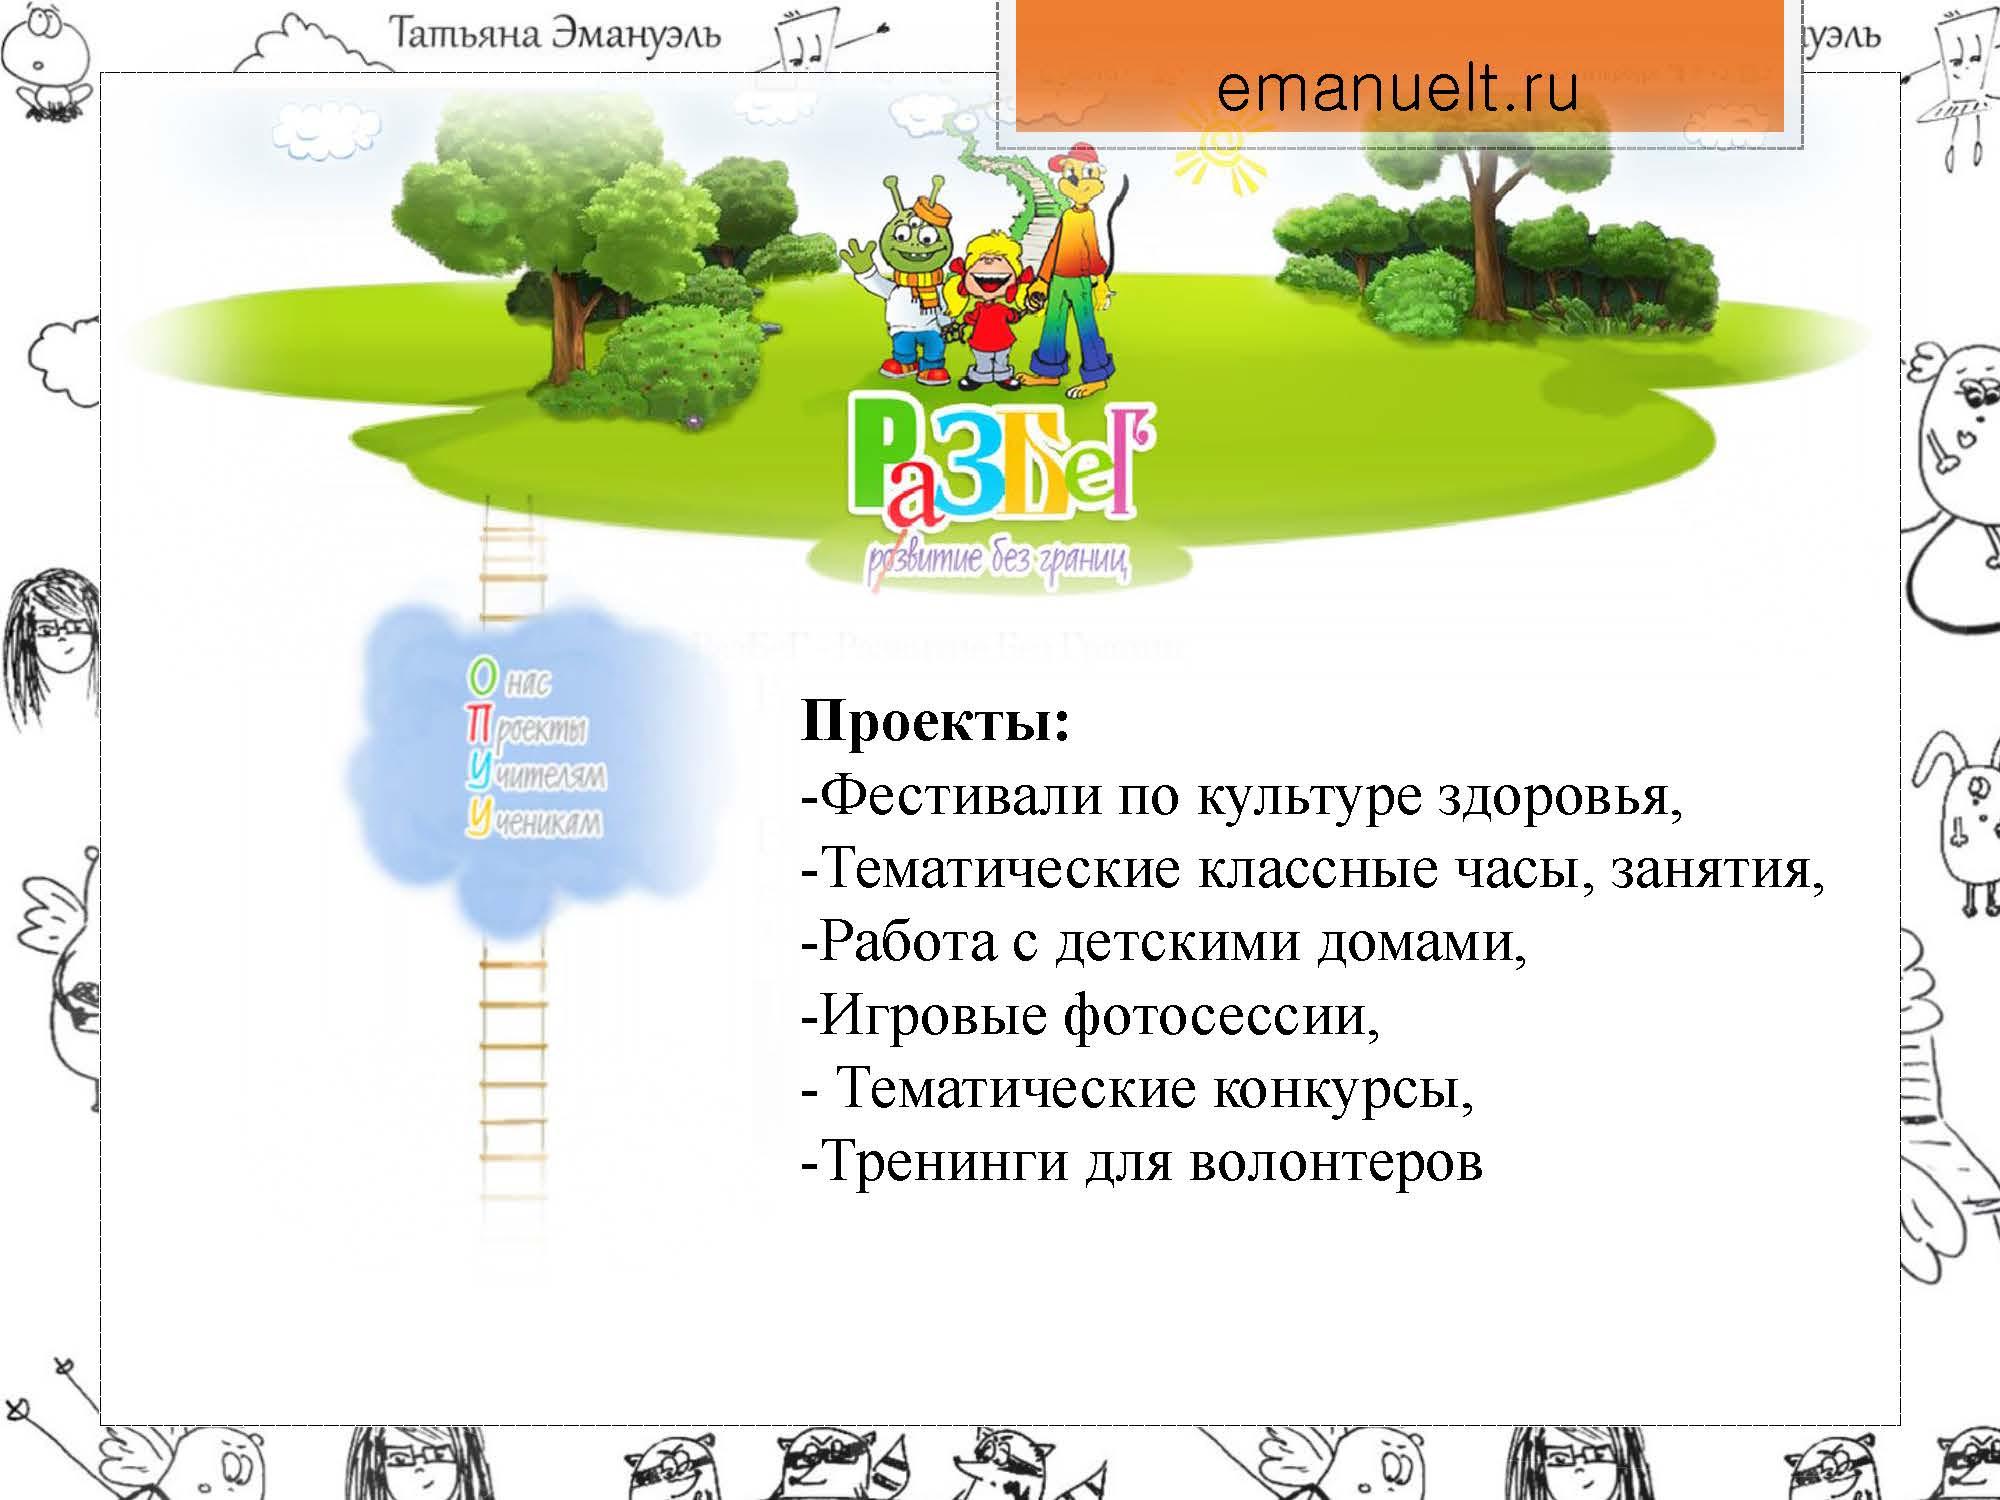 RazBeG_Emanuel_Страница_02